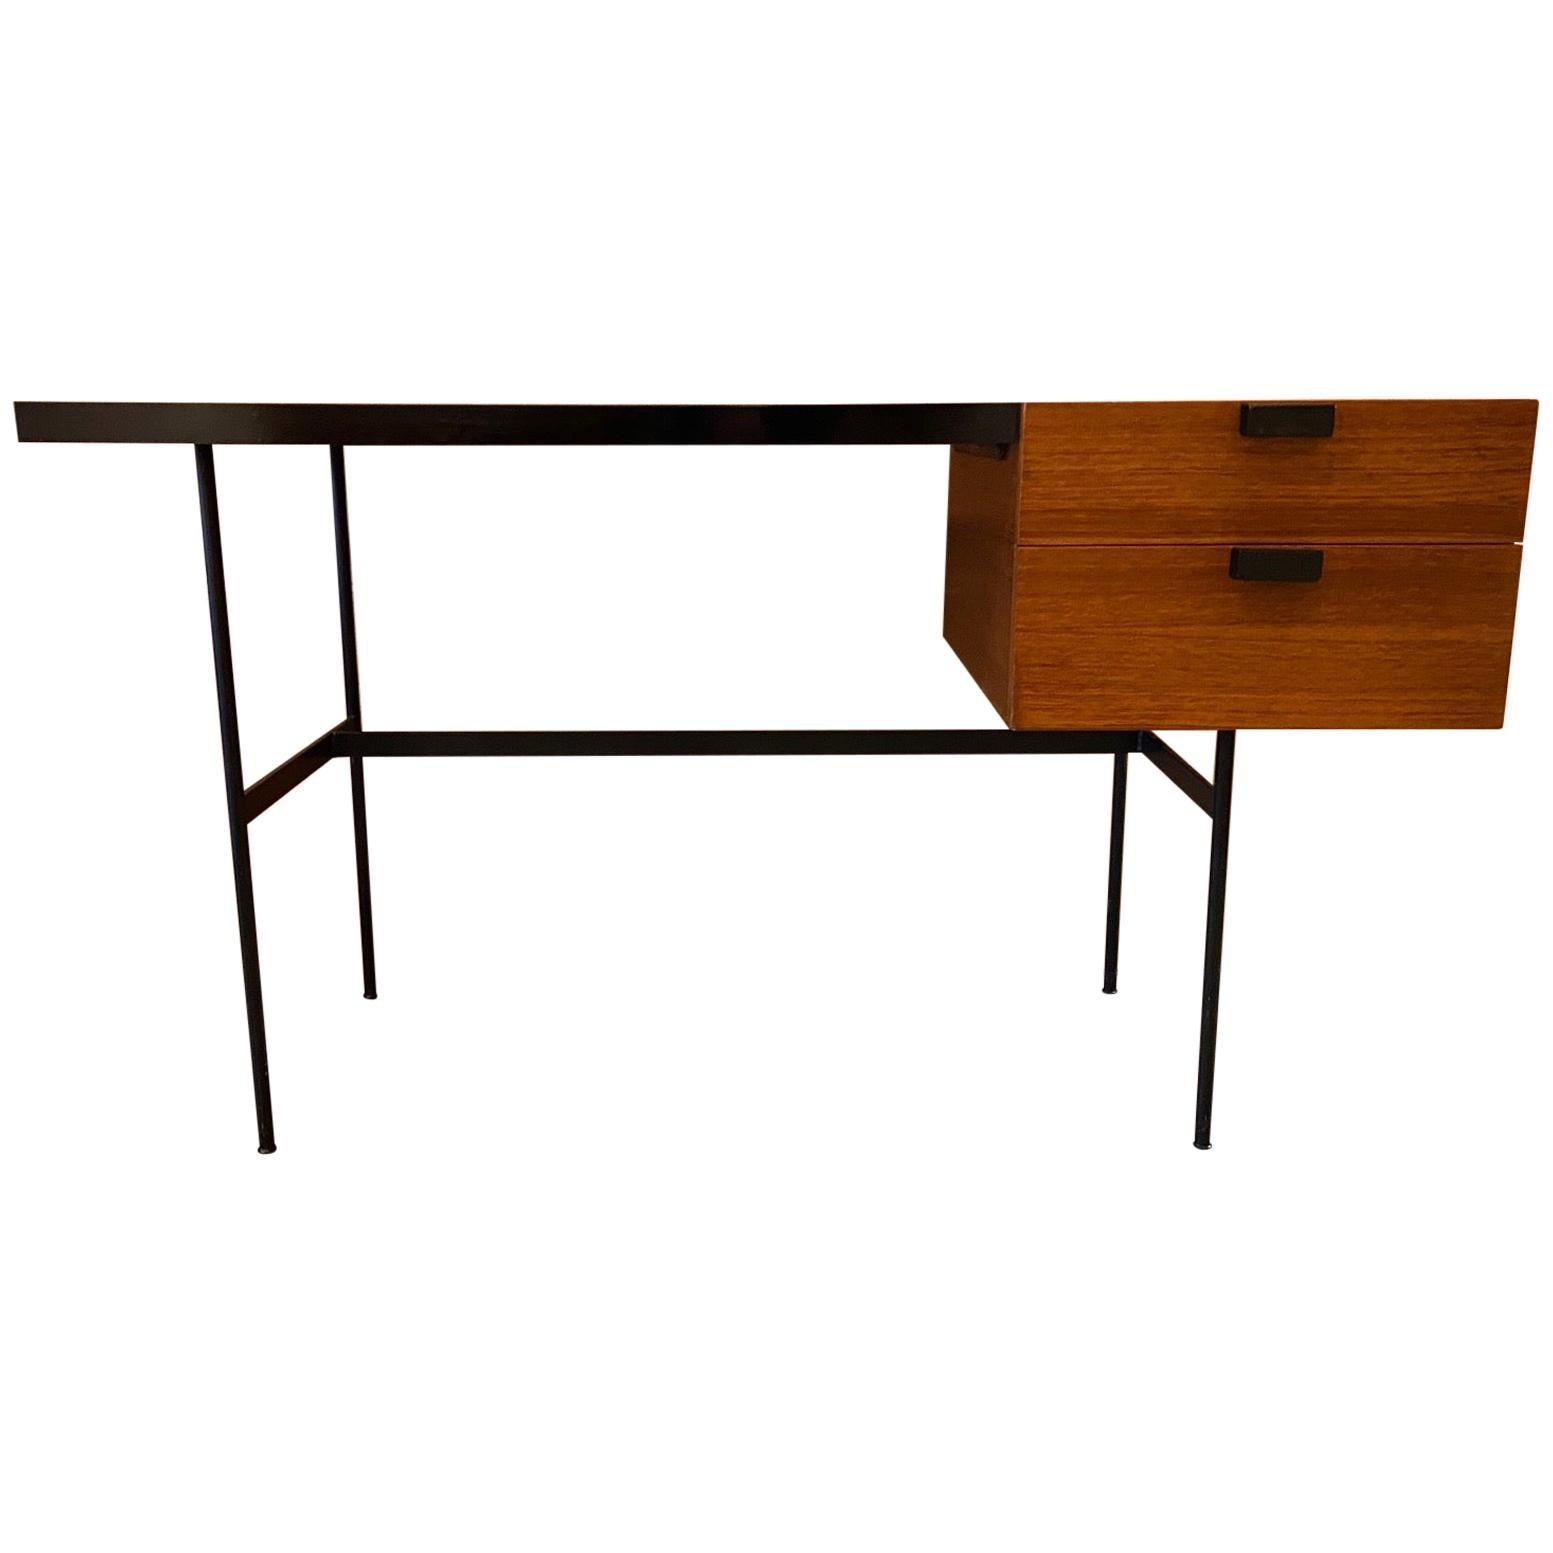 Desk CM141 by Pierre Paulin, Thonet Edition, 1954